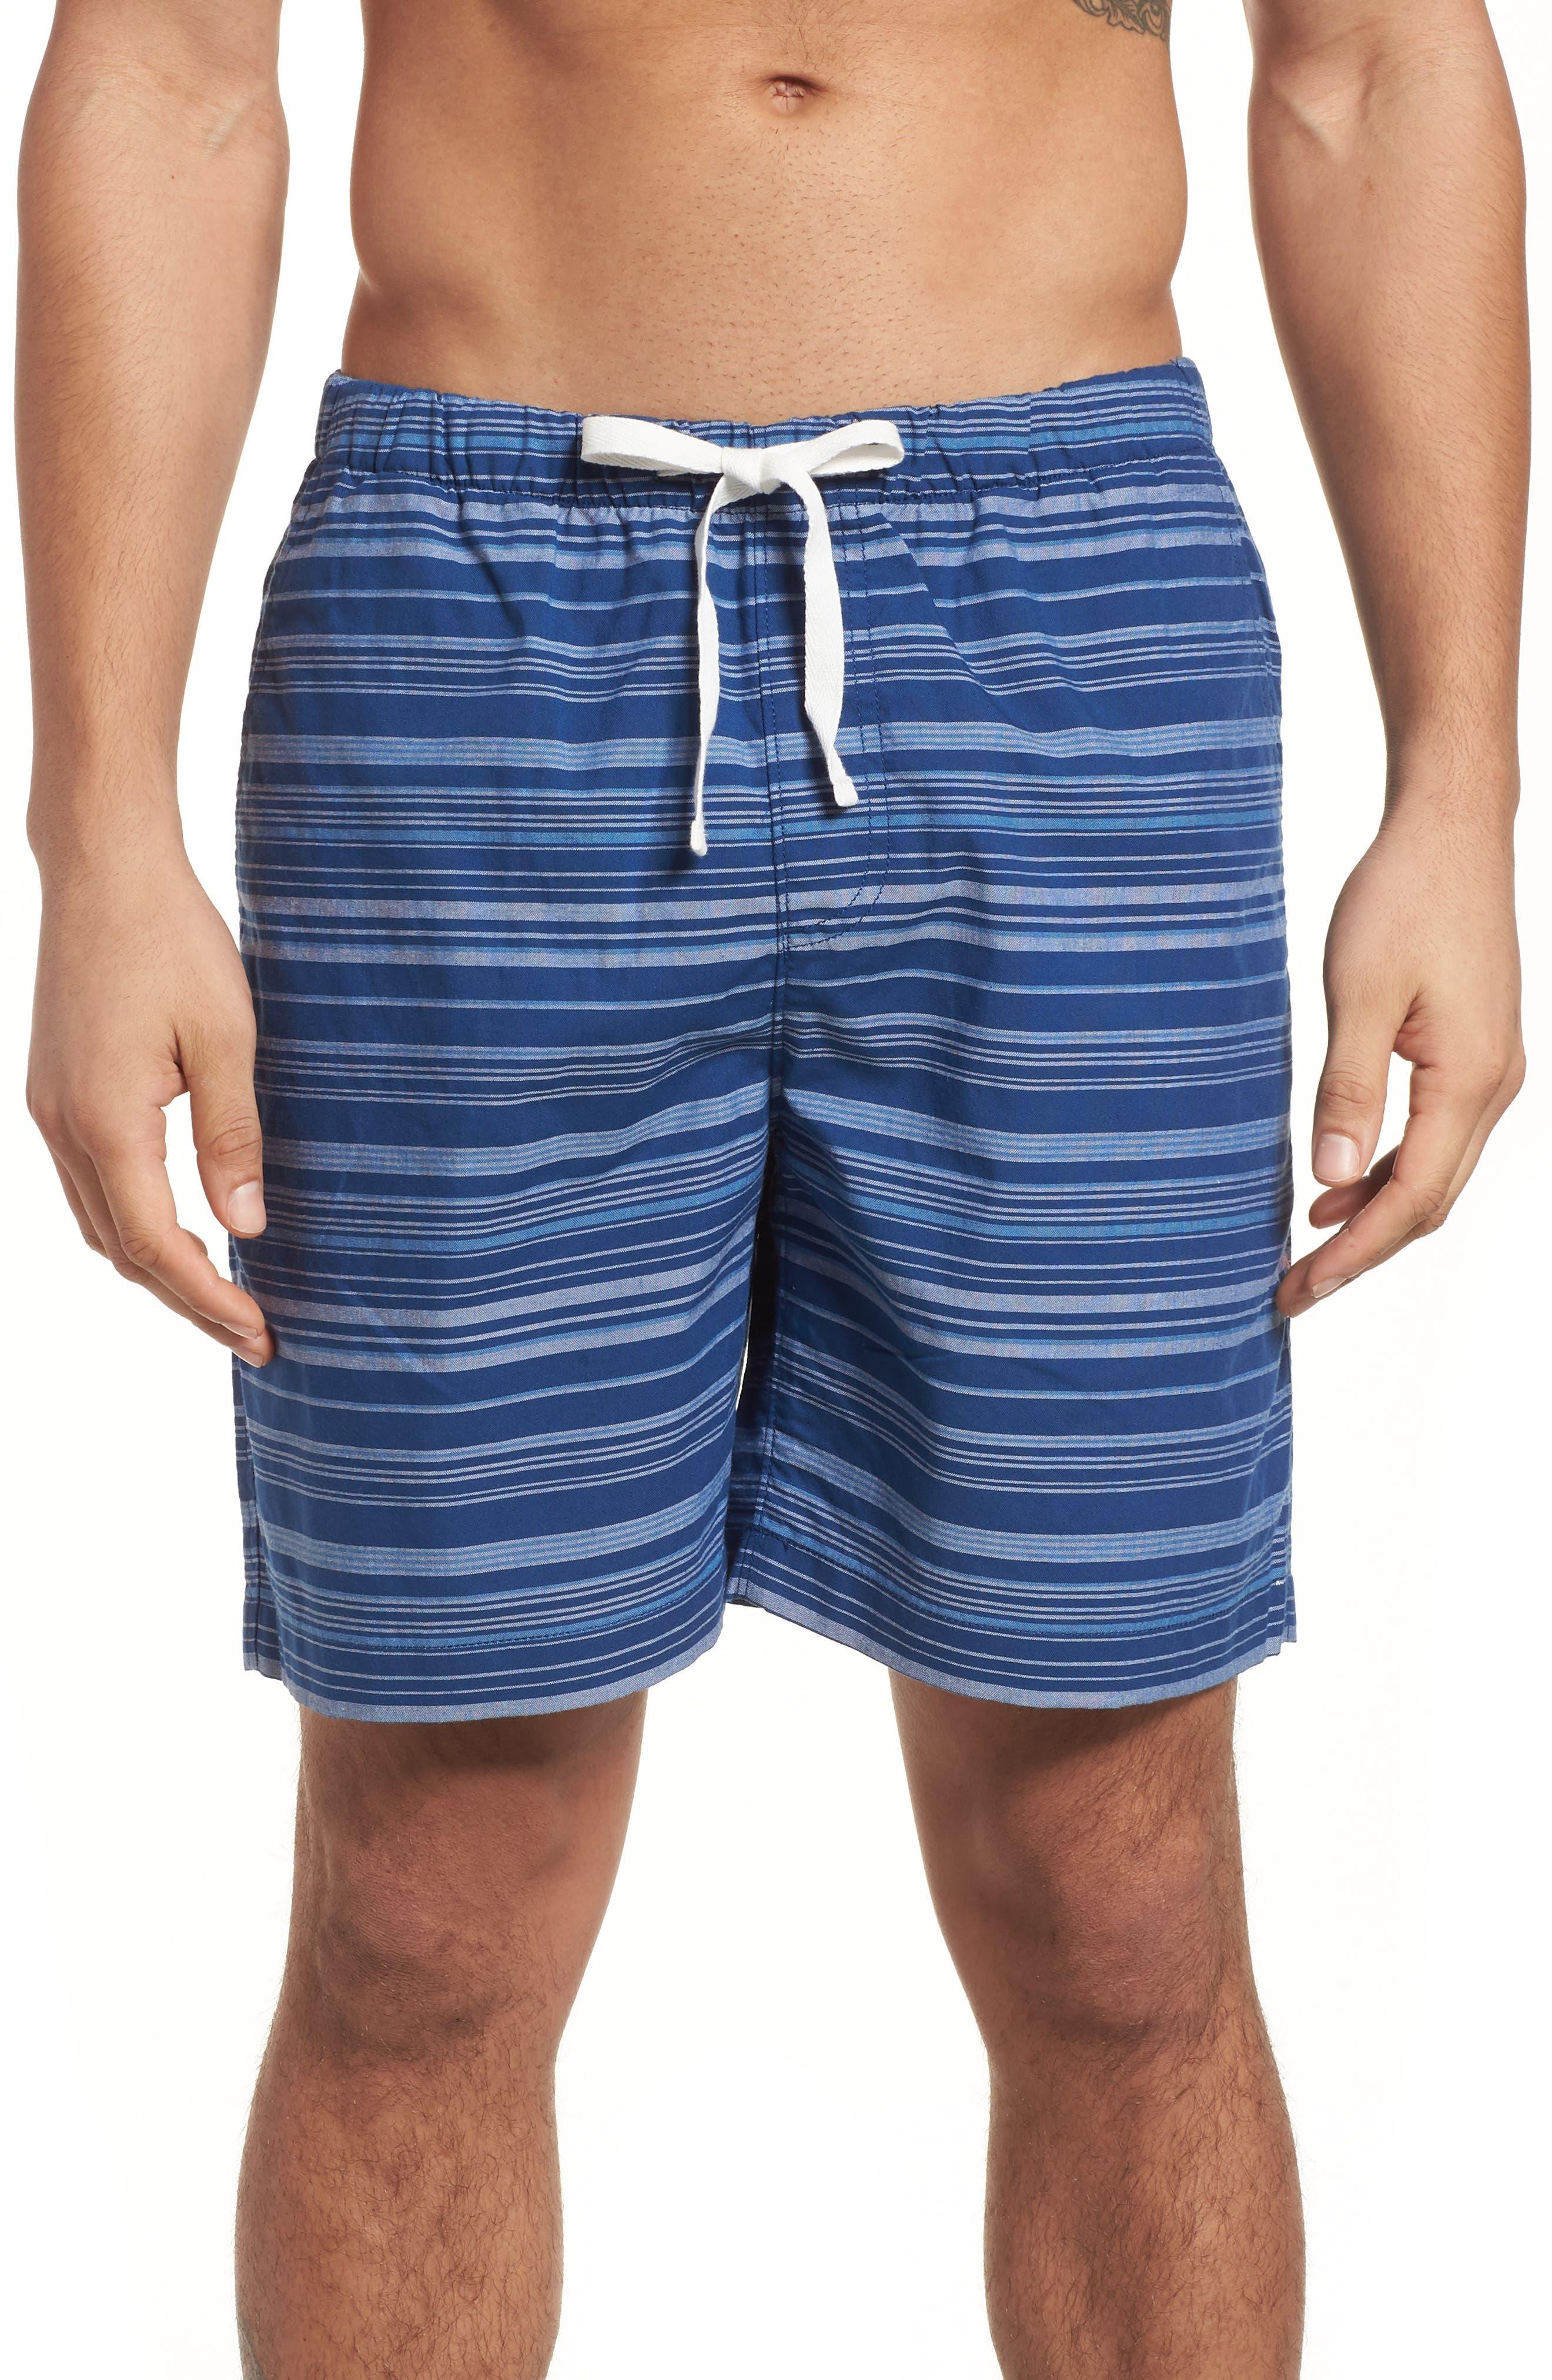 Hammock Board Shorts,                         Main,                         color, Seven Seas Blue